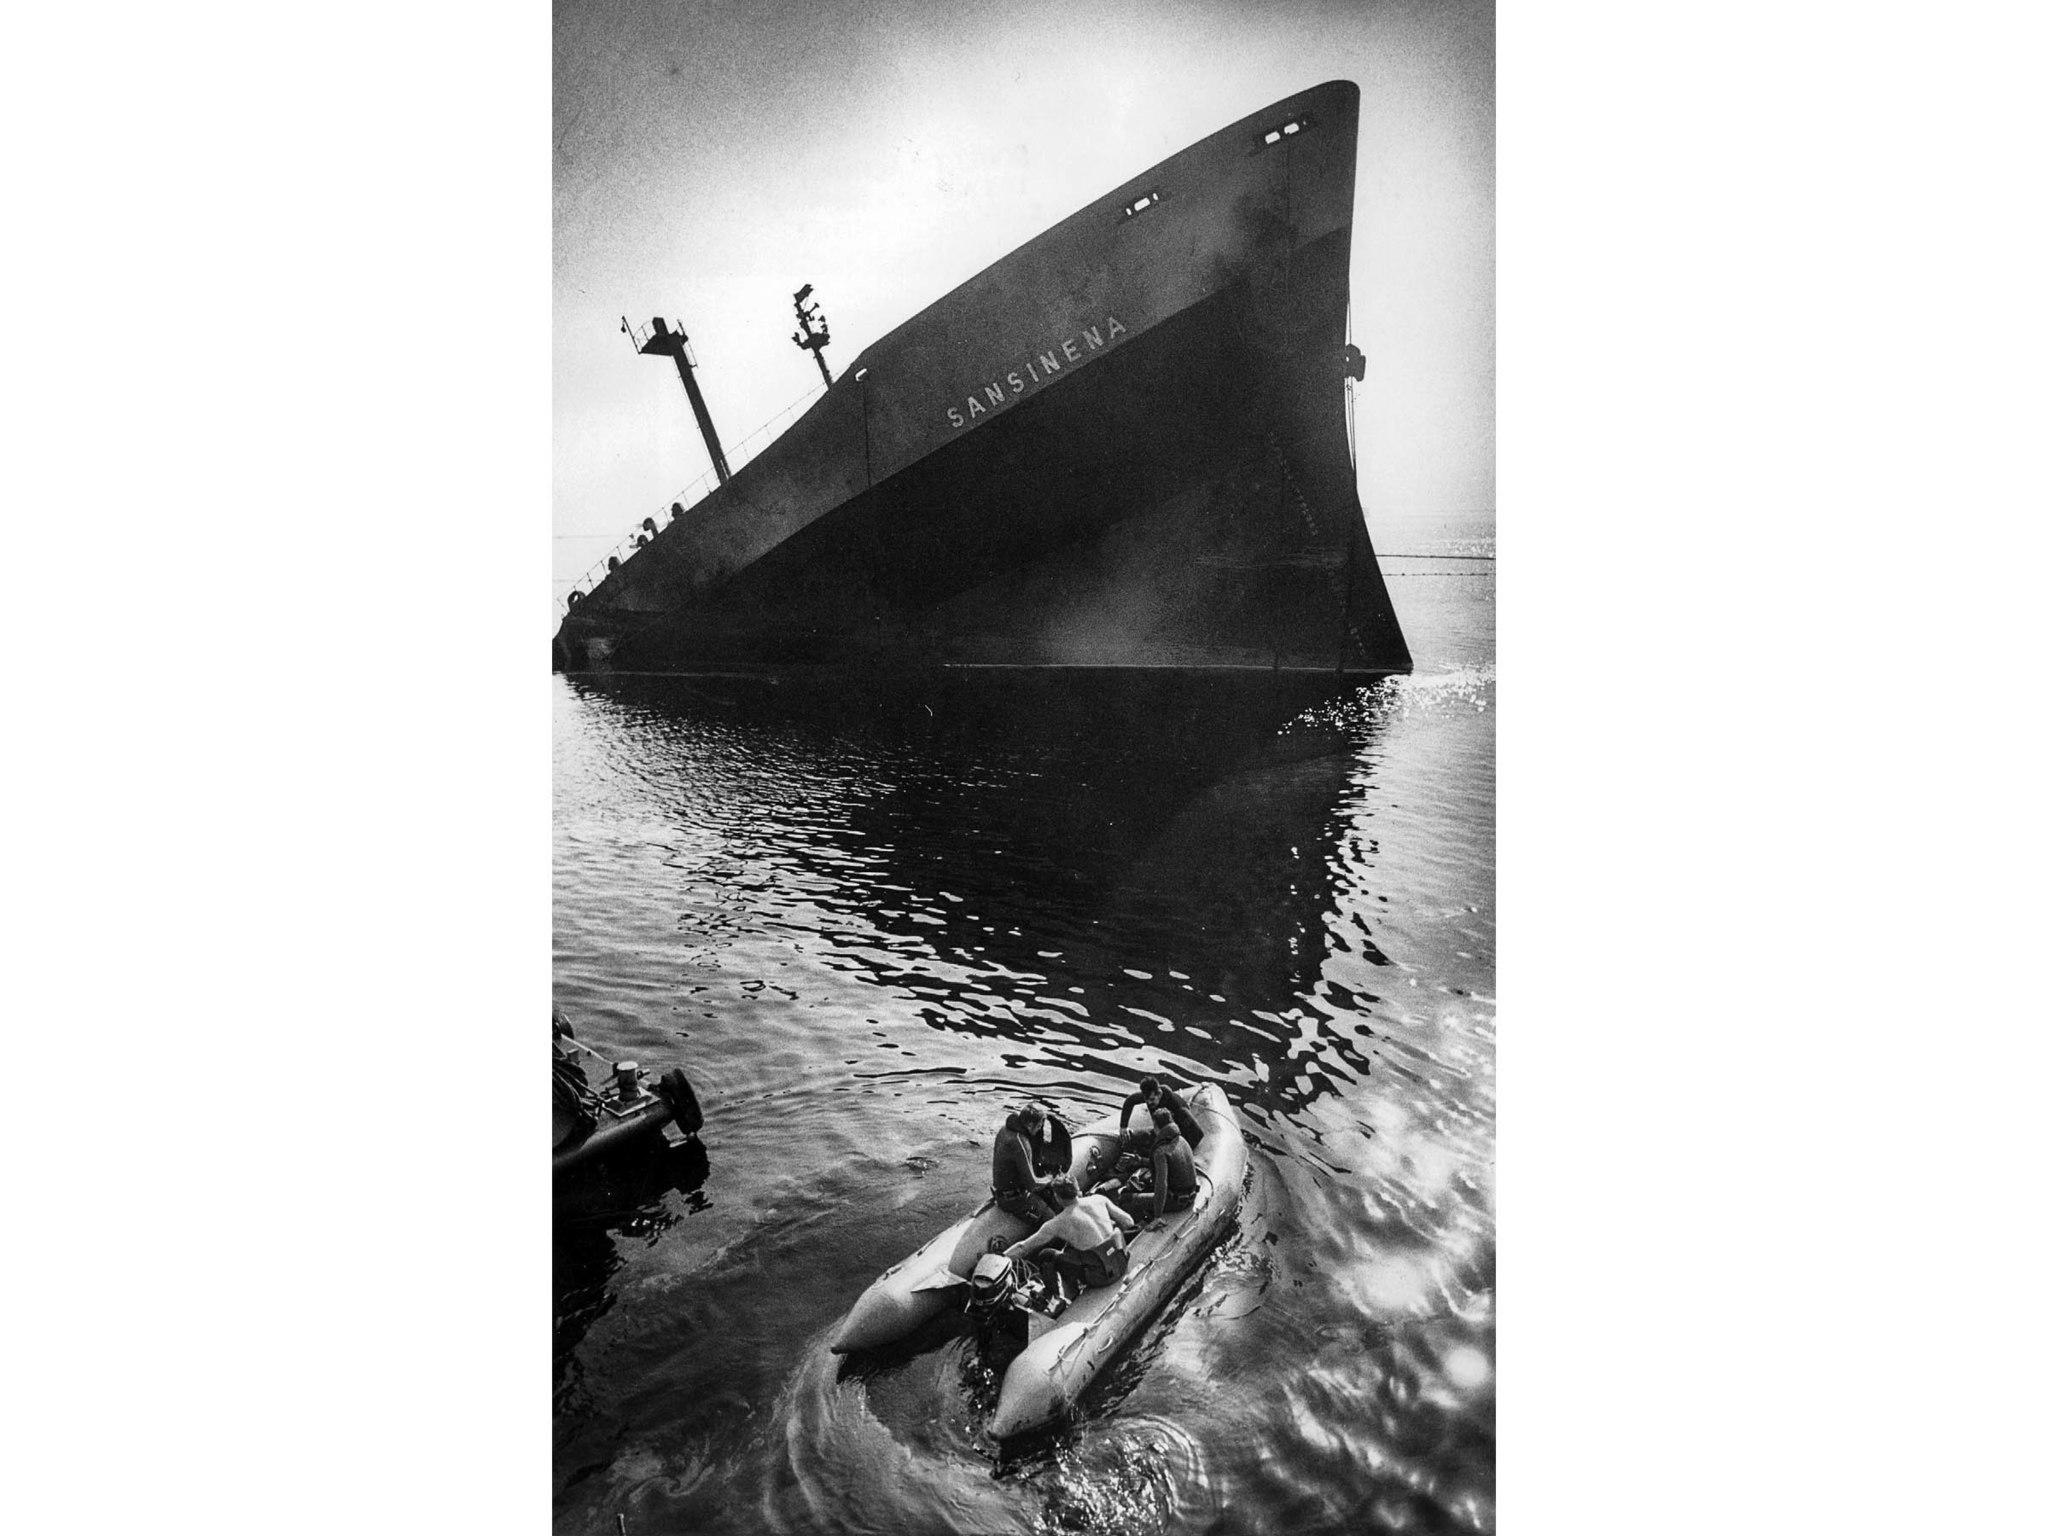 Dec. 20, 1976: U.S. Coast Guard divers prepare to search the water around the Sansinena.